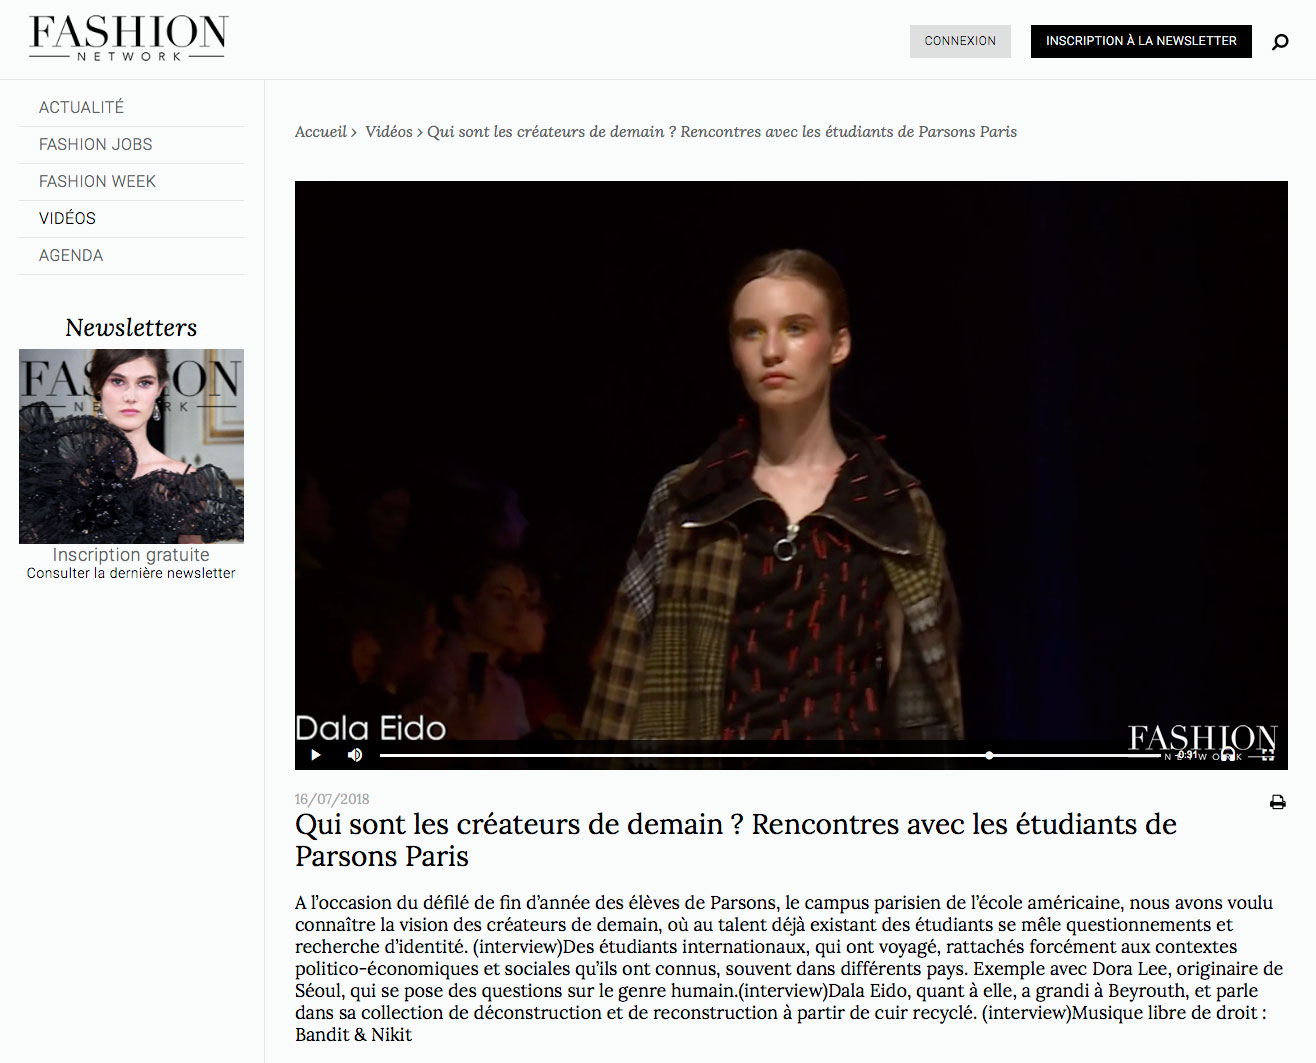 - Fashion Network